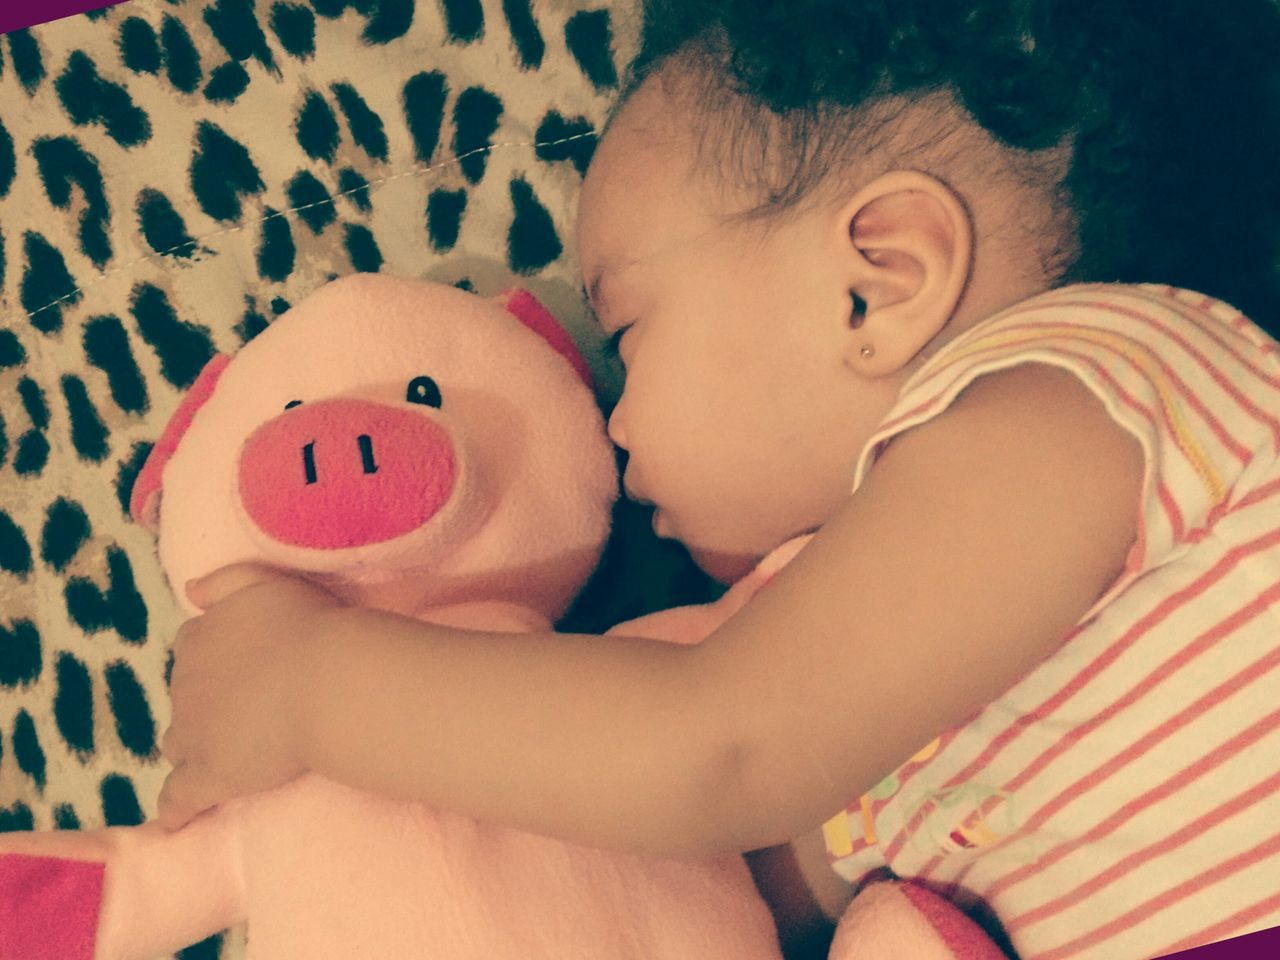 Linda bebedormindo descansodamamae bebe muitolinda mamaeama Amordemãe Amomuitotudoisso Riodejaneiro Soninho #love soninho Soninhoooo😇😘😍